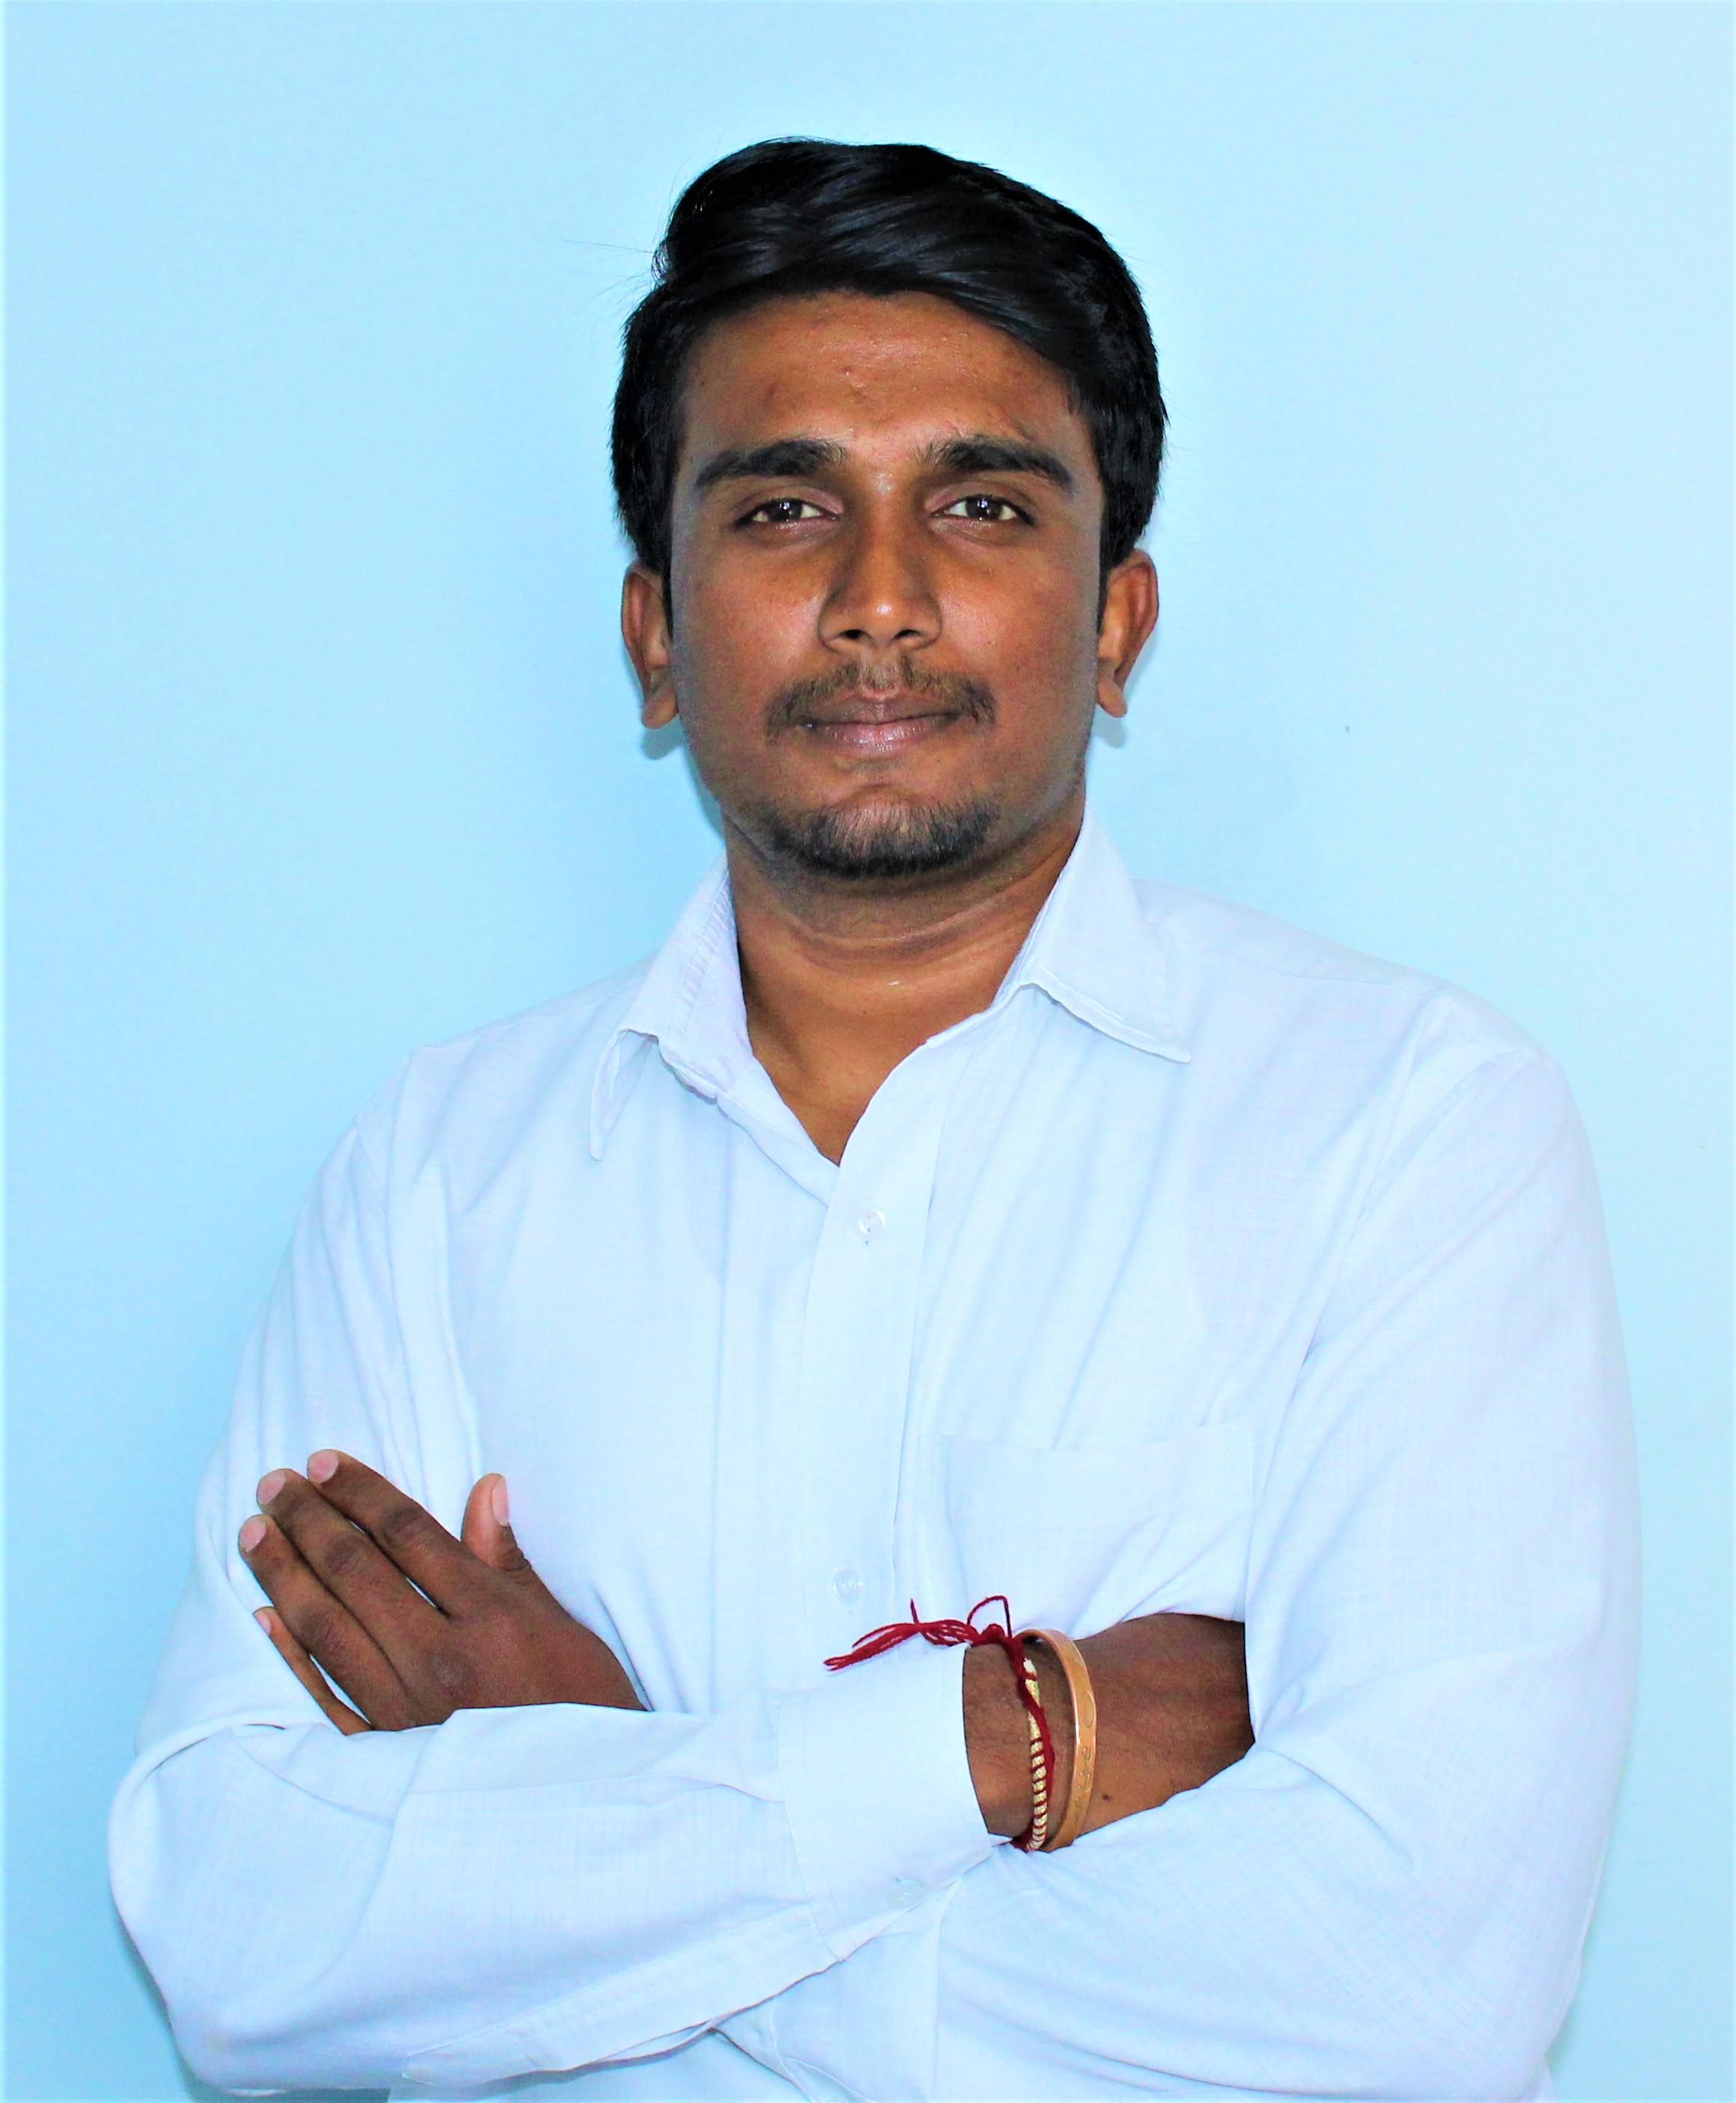 Abhimanyu k